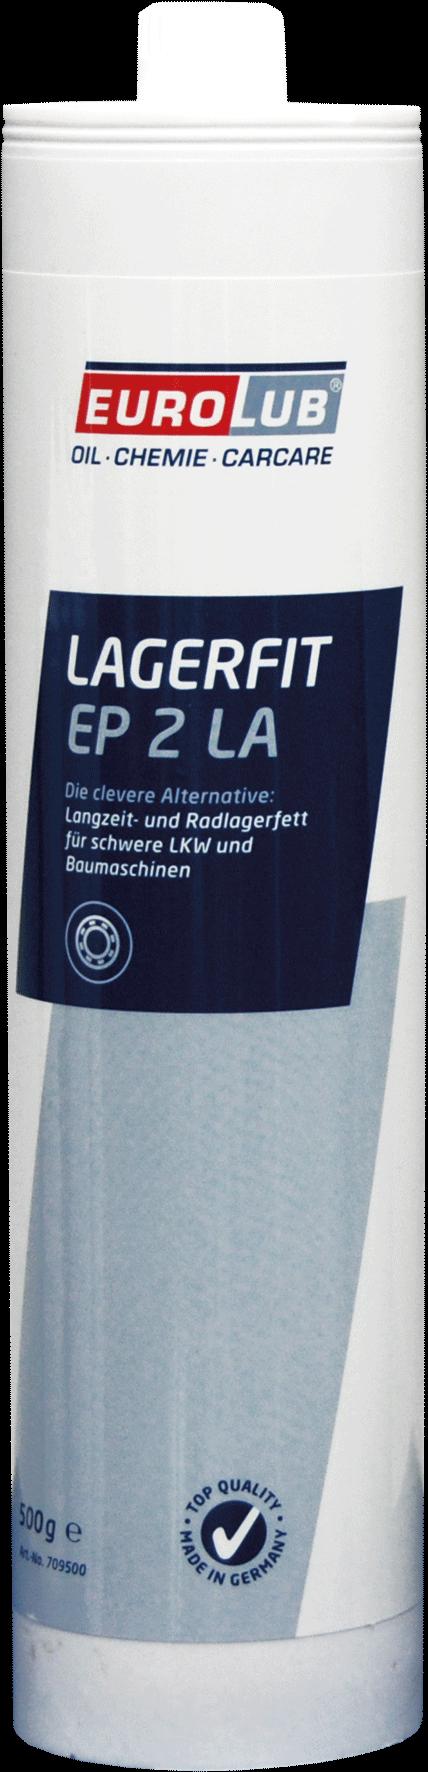 EUROLUB LAGERFIT EP 2 LA (литиевая смазка), 0.5л